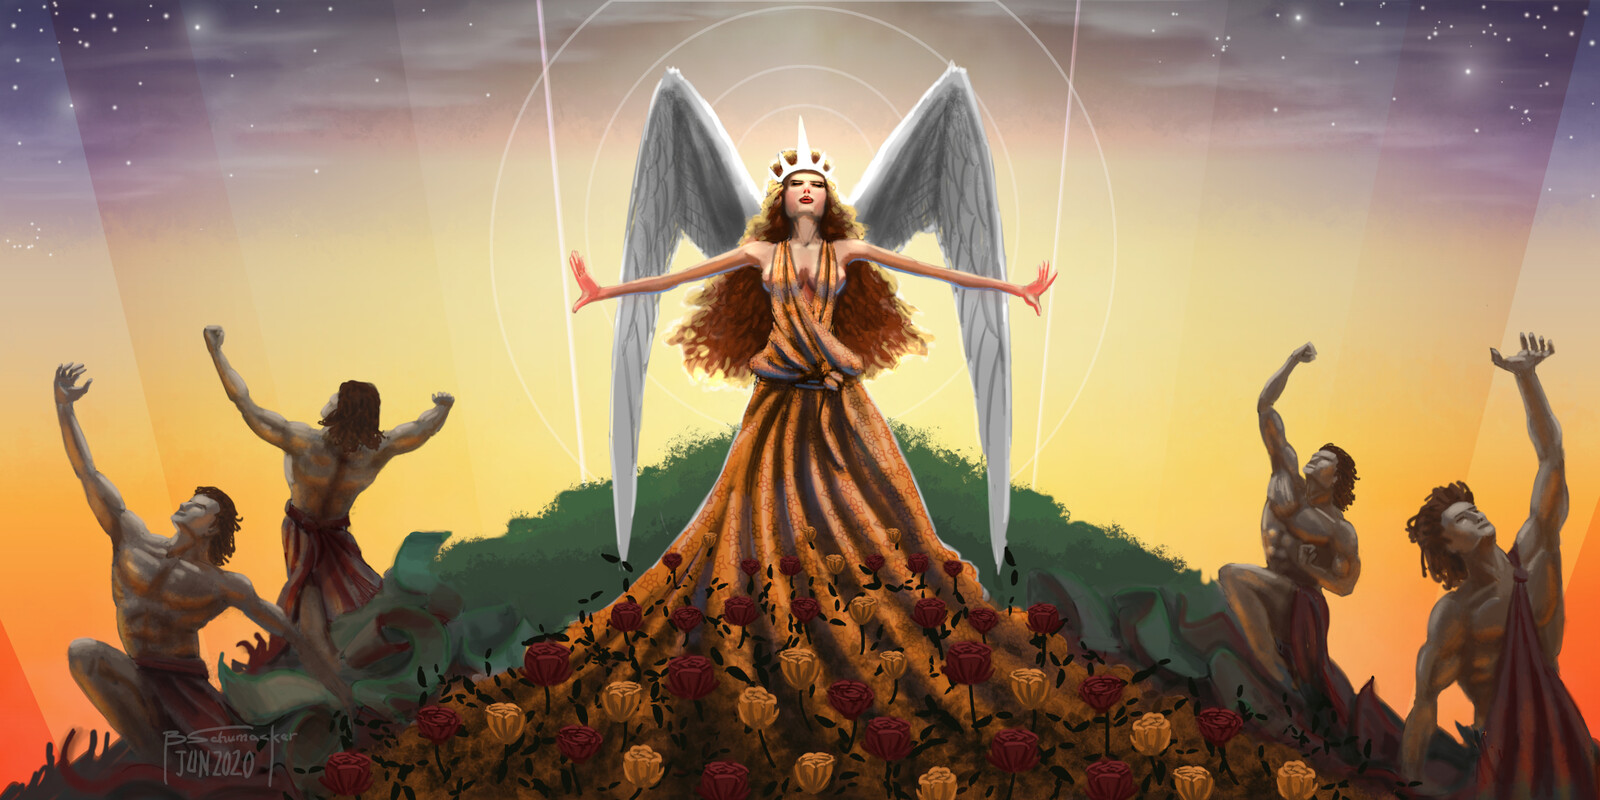 Eos - The Goddess of Dawn